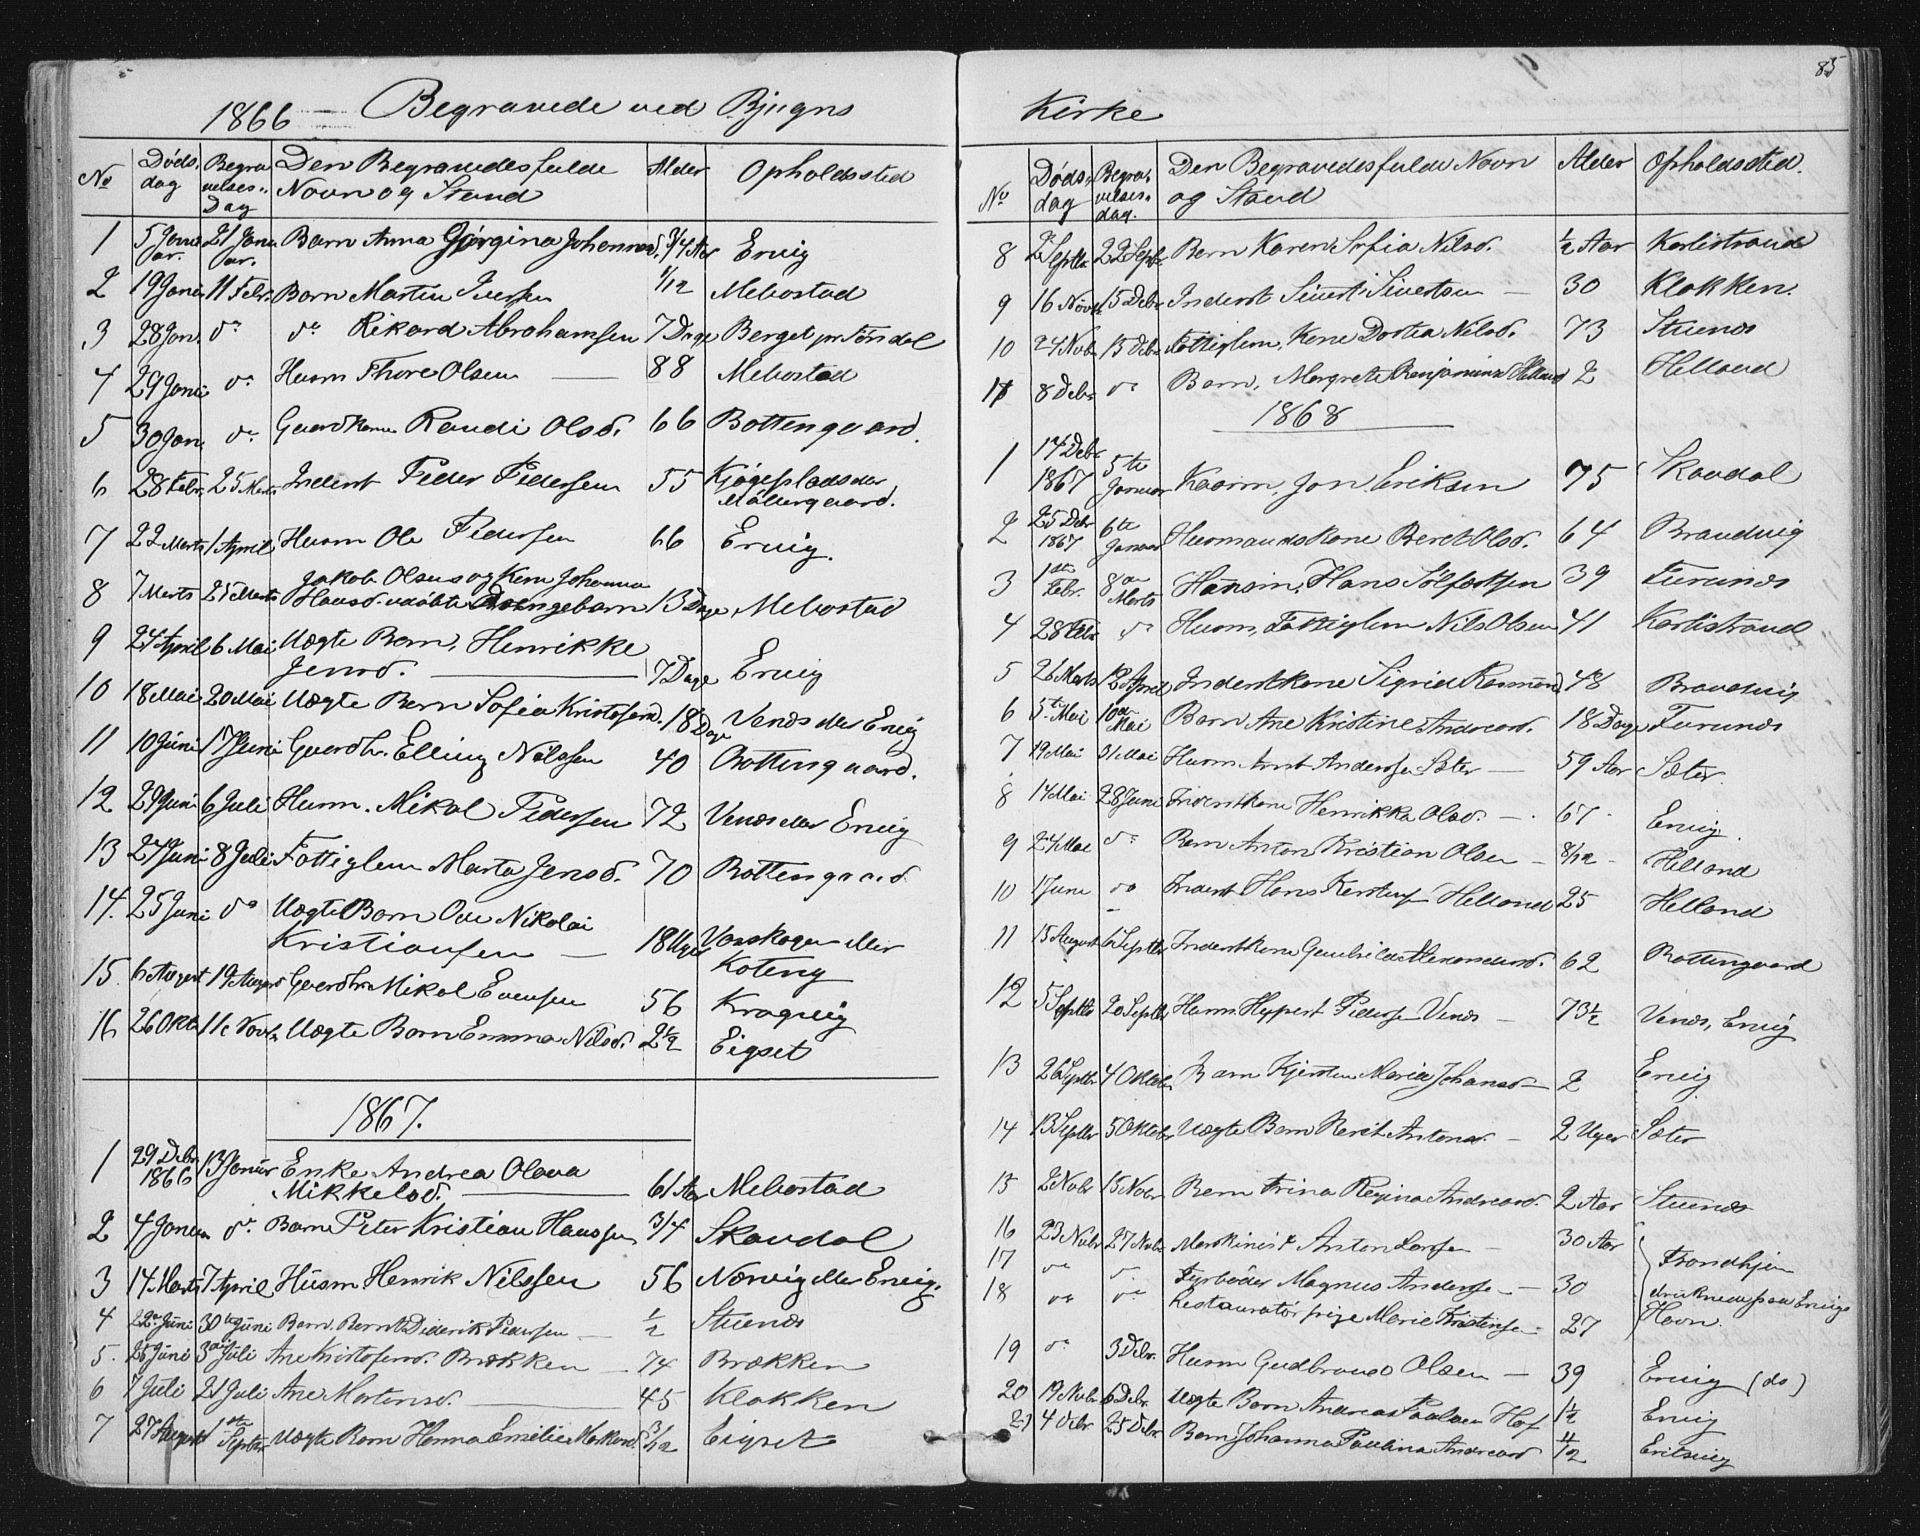 SAT, Ministerialprotokoller, klokkerbøker og fødselsregistre - Sør-Trøndelag, 651/L0647: Parish register (copy) no. 651C01, 1866-1914, p. 85